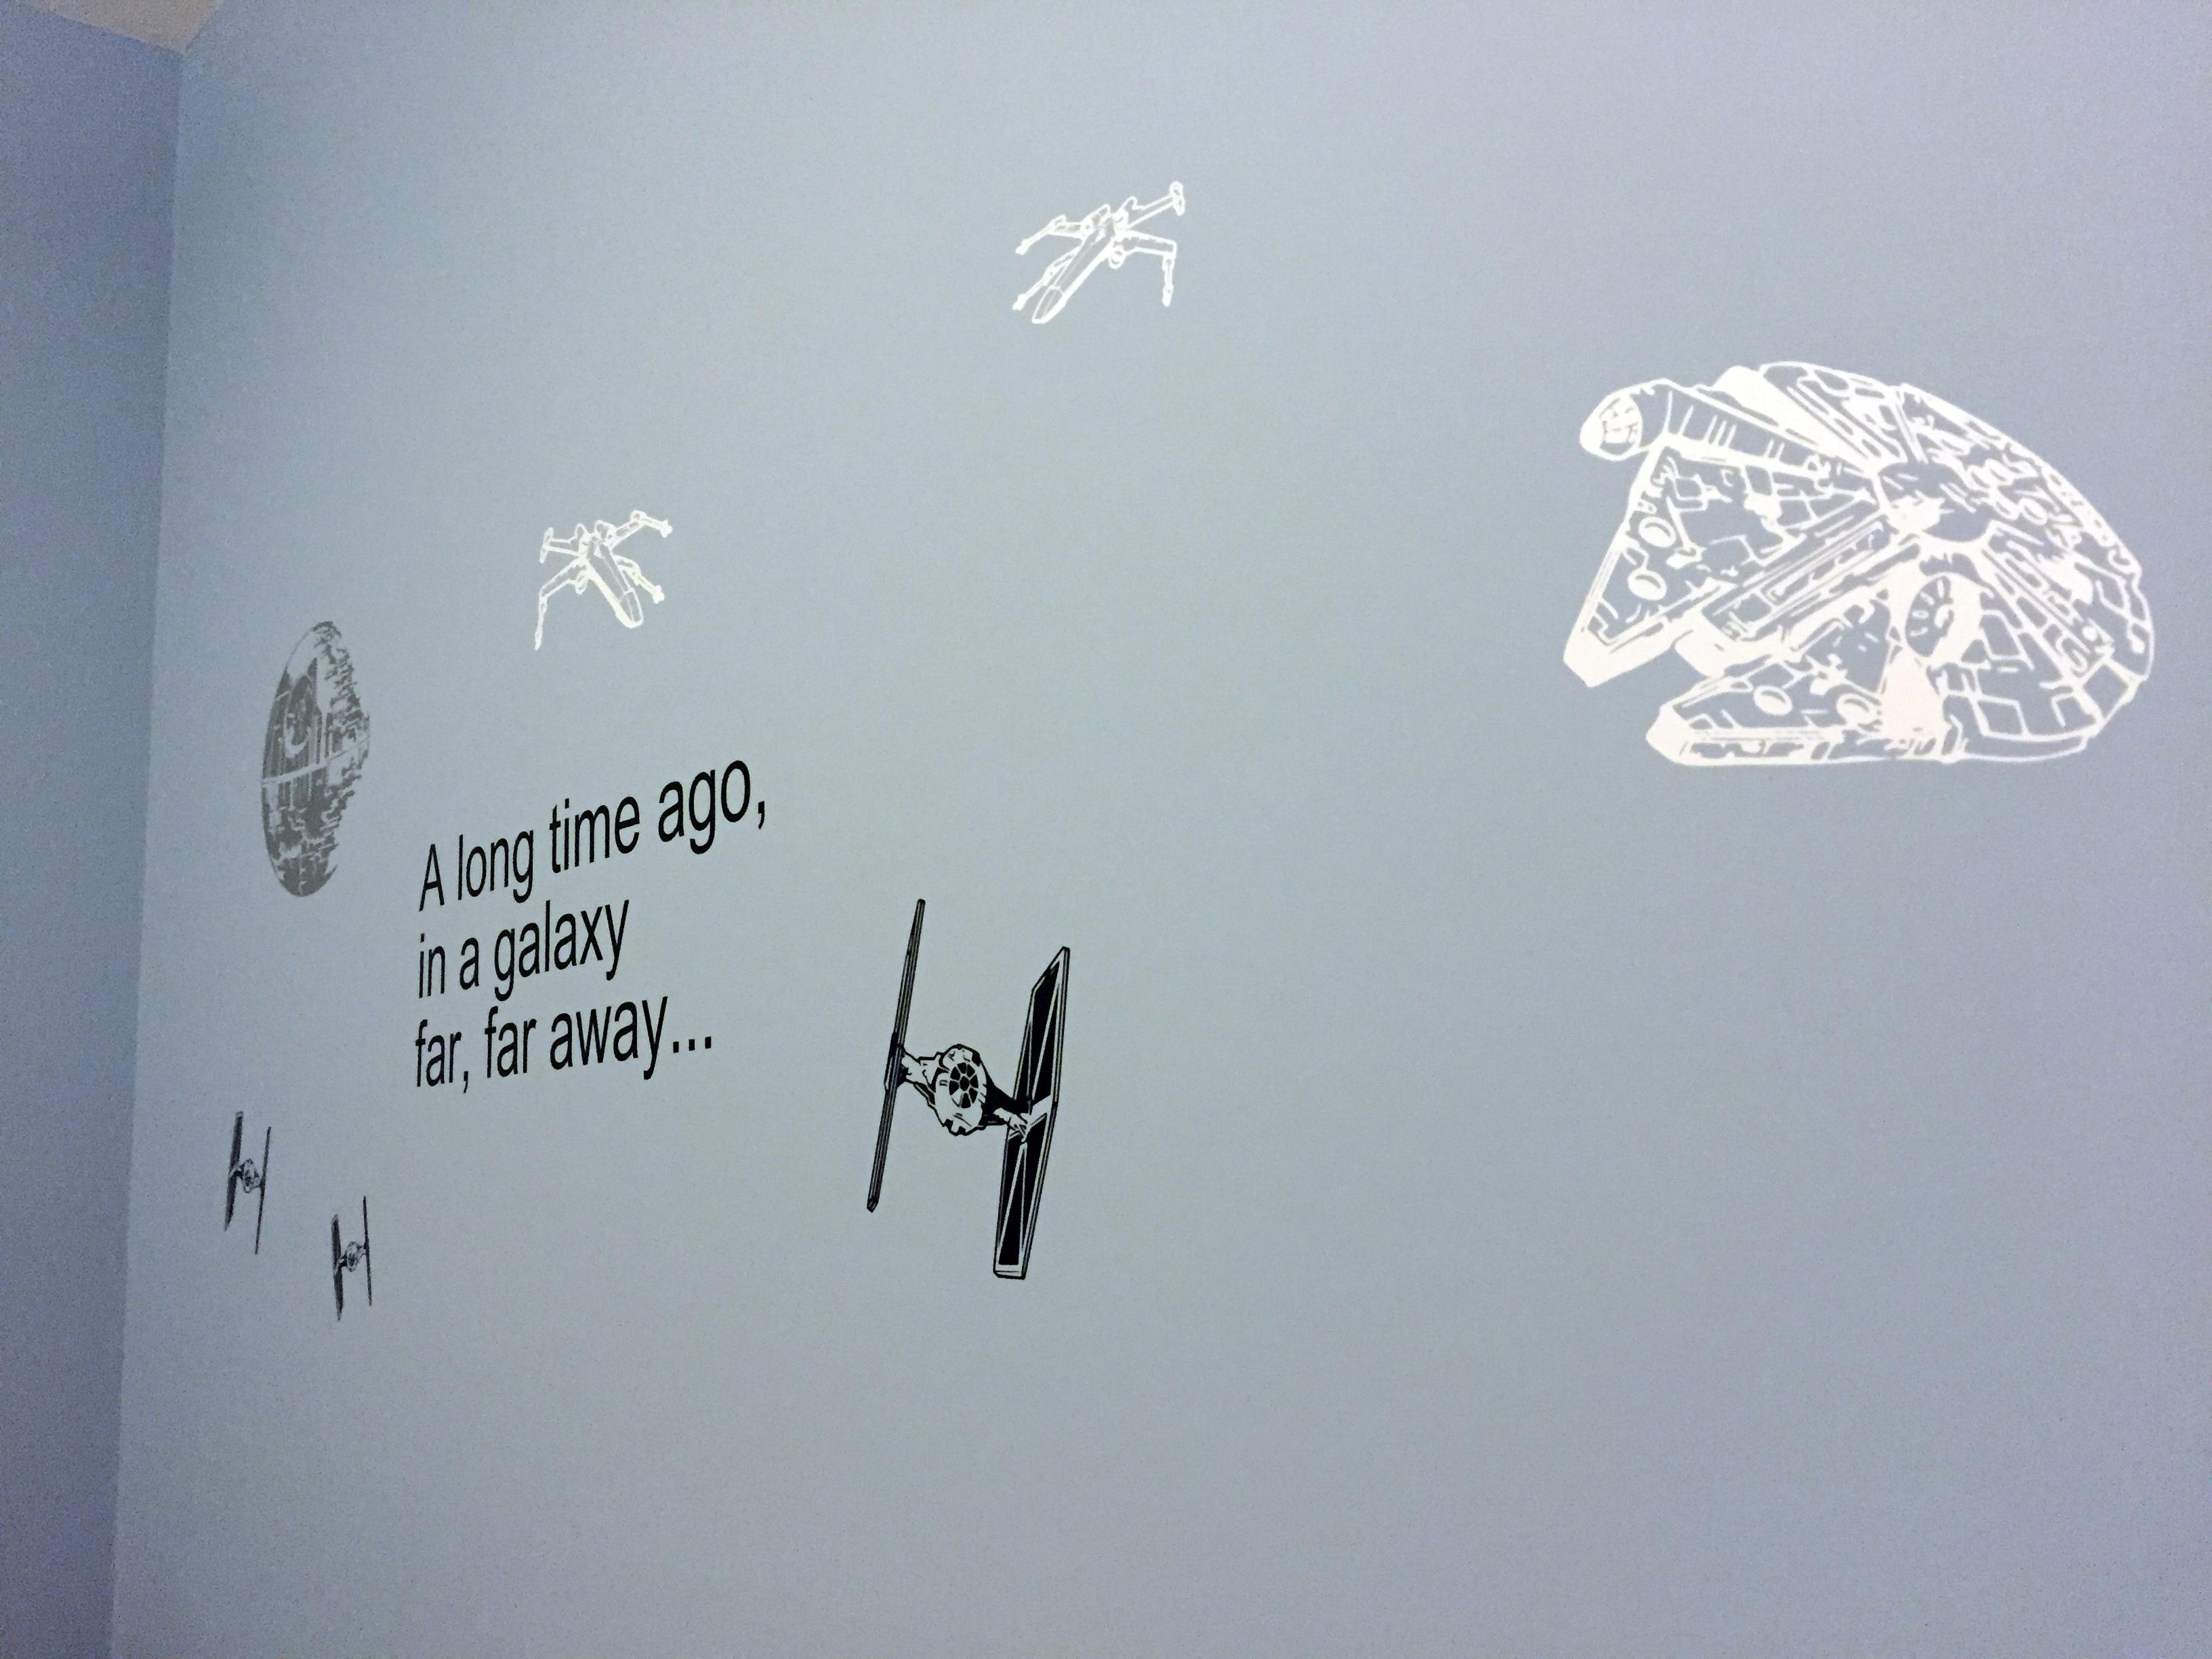 star-wars-vinyl-decal-wall-2